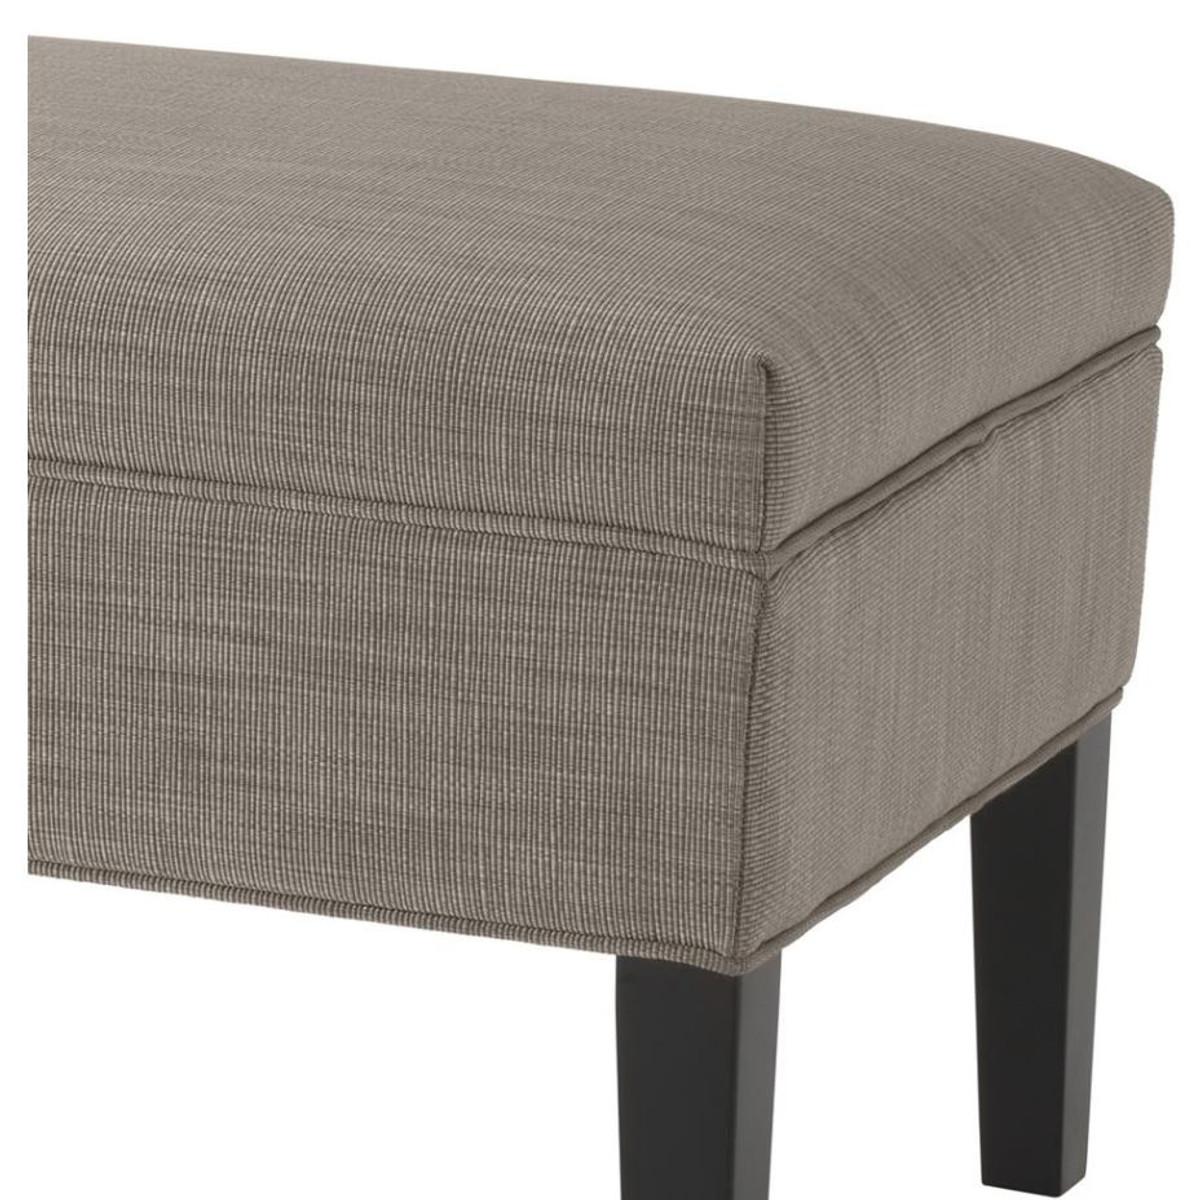 casa padrino designer sitzbank hellbraun 140 x 50 x h 45. Black Bedroom Furniture Sets. Home Design Ideas